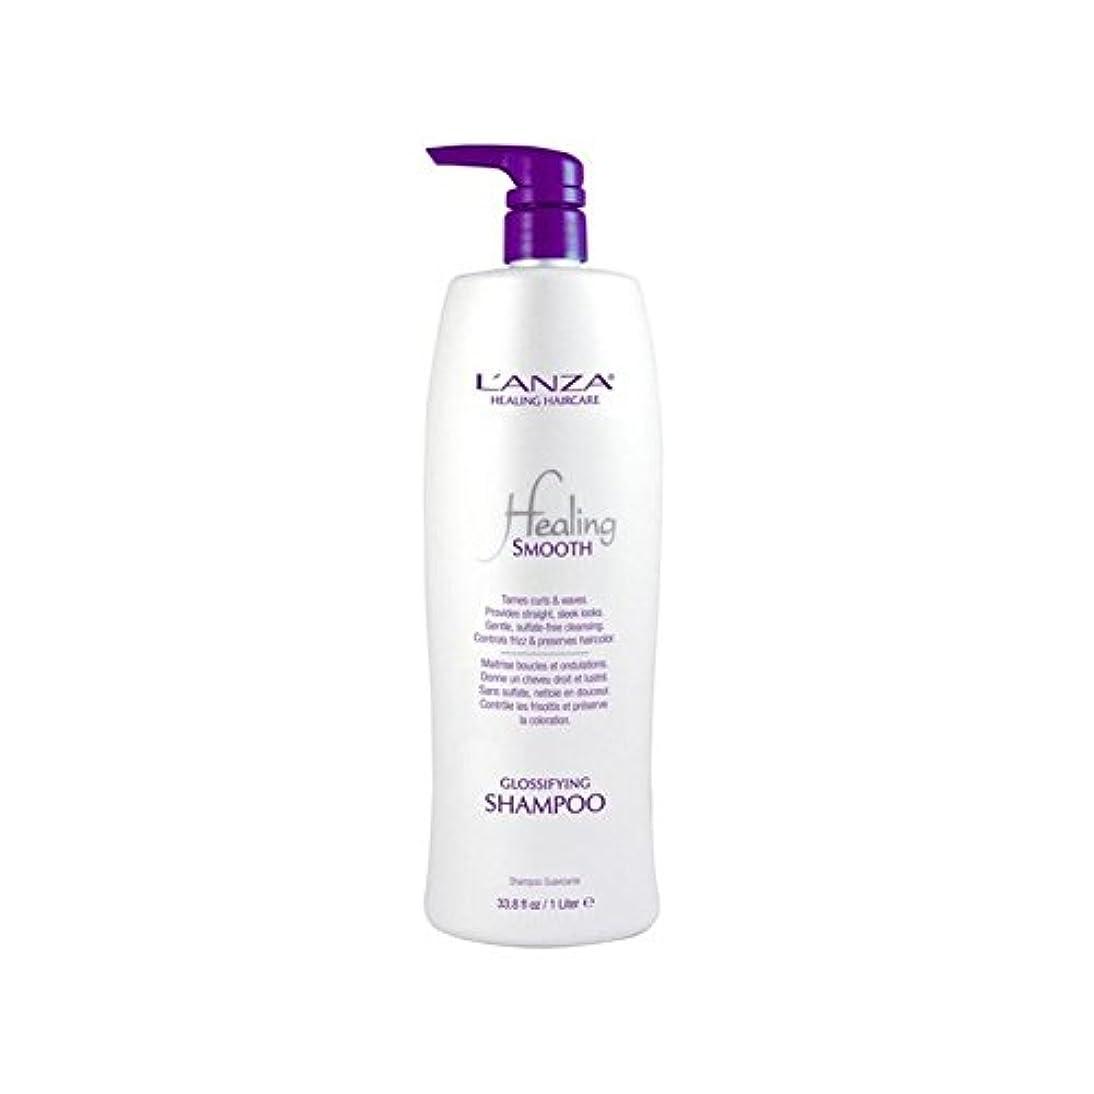 Lanza Healing Smooth Glossifying Shampoo (1000ml) - ランツァスムーズシャンプーを癒し(千ミリリットル) [並行輸入品]